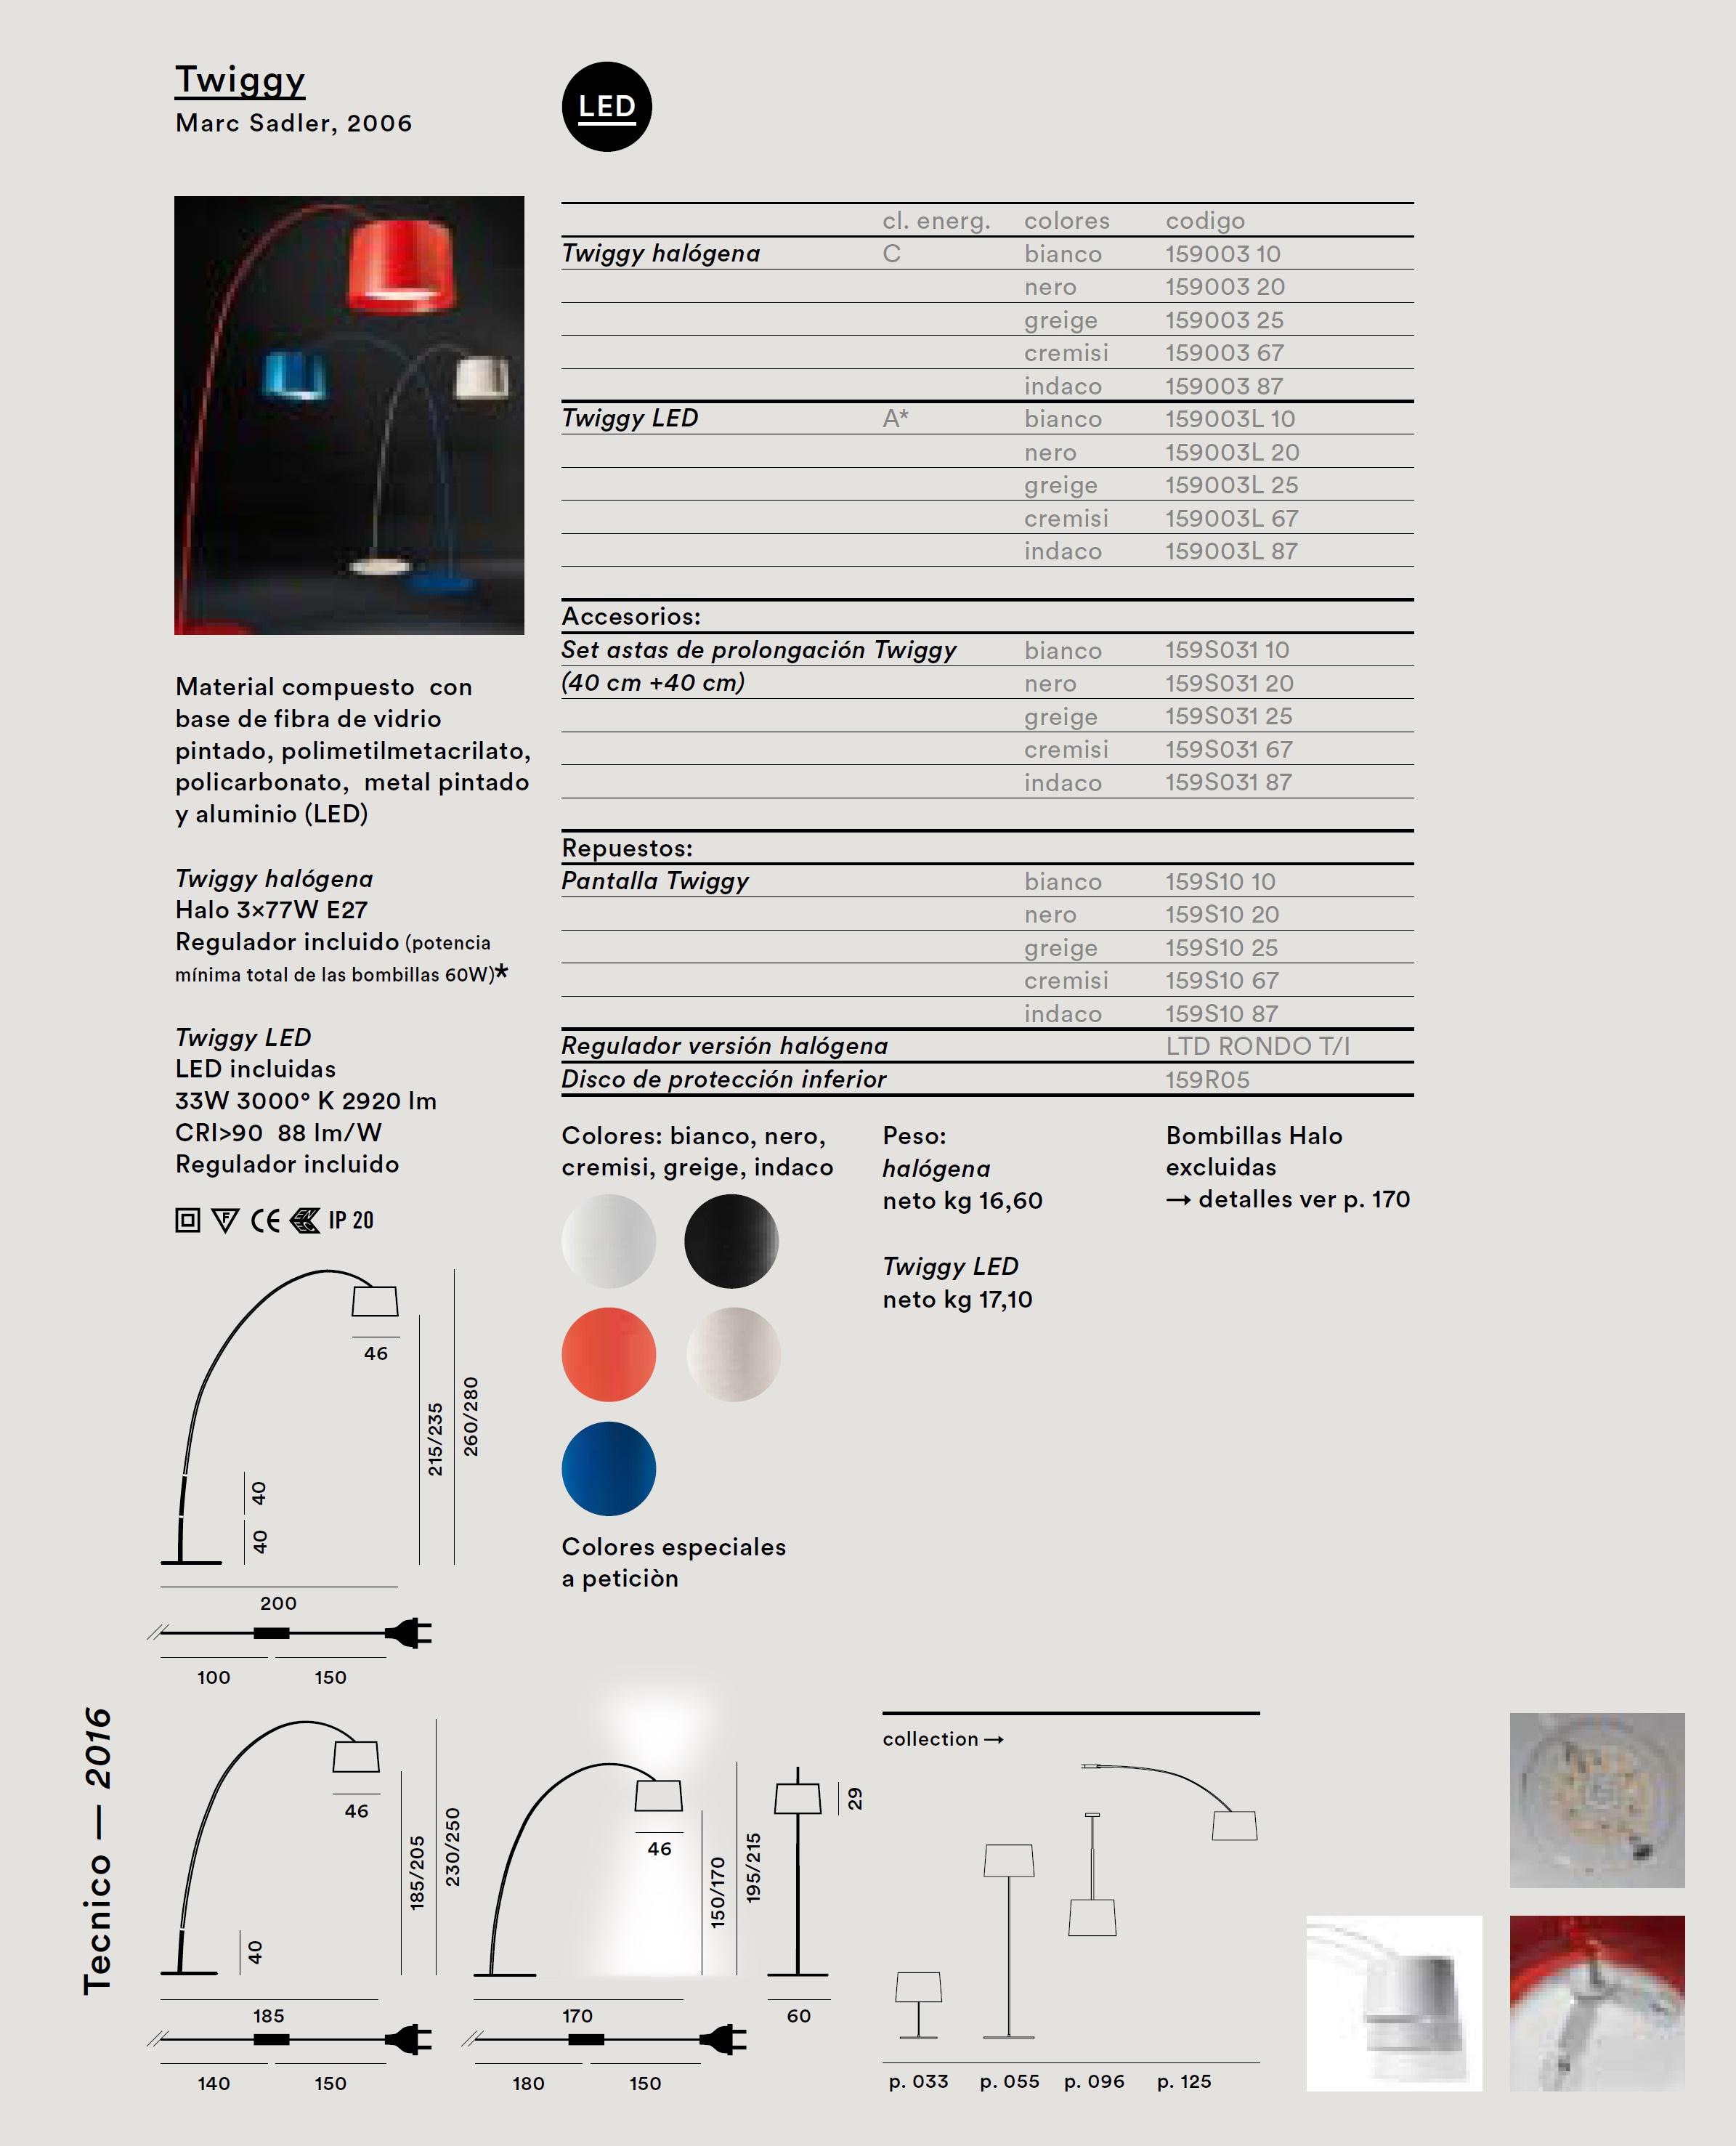 foscarini twiggy zubeh rteil reitzeug f r 159s03lr1 20. Black Bedroom Furniture Sets. Home Design Ideas